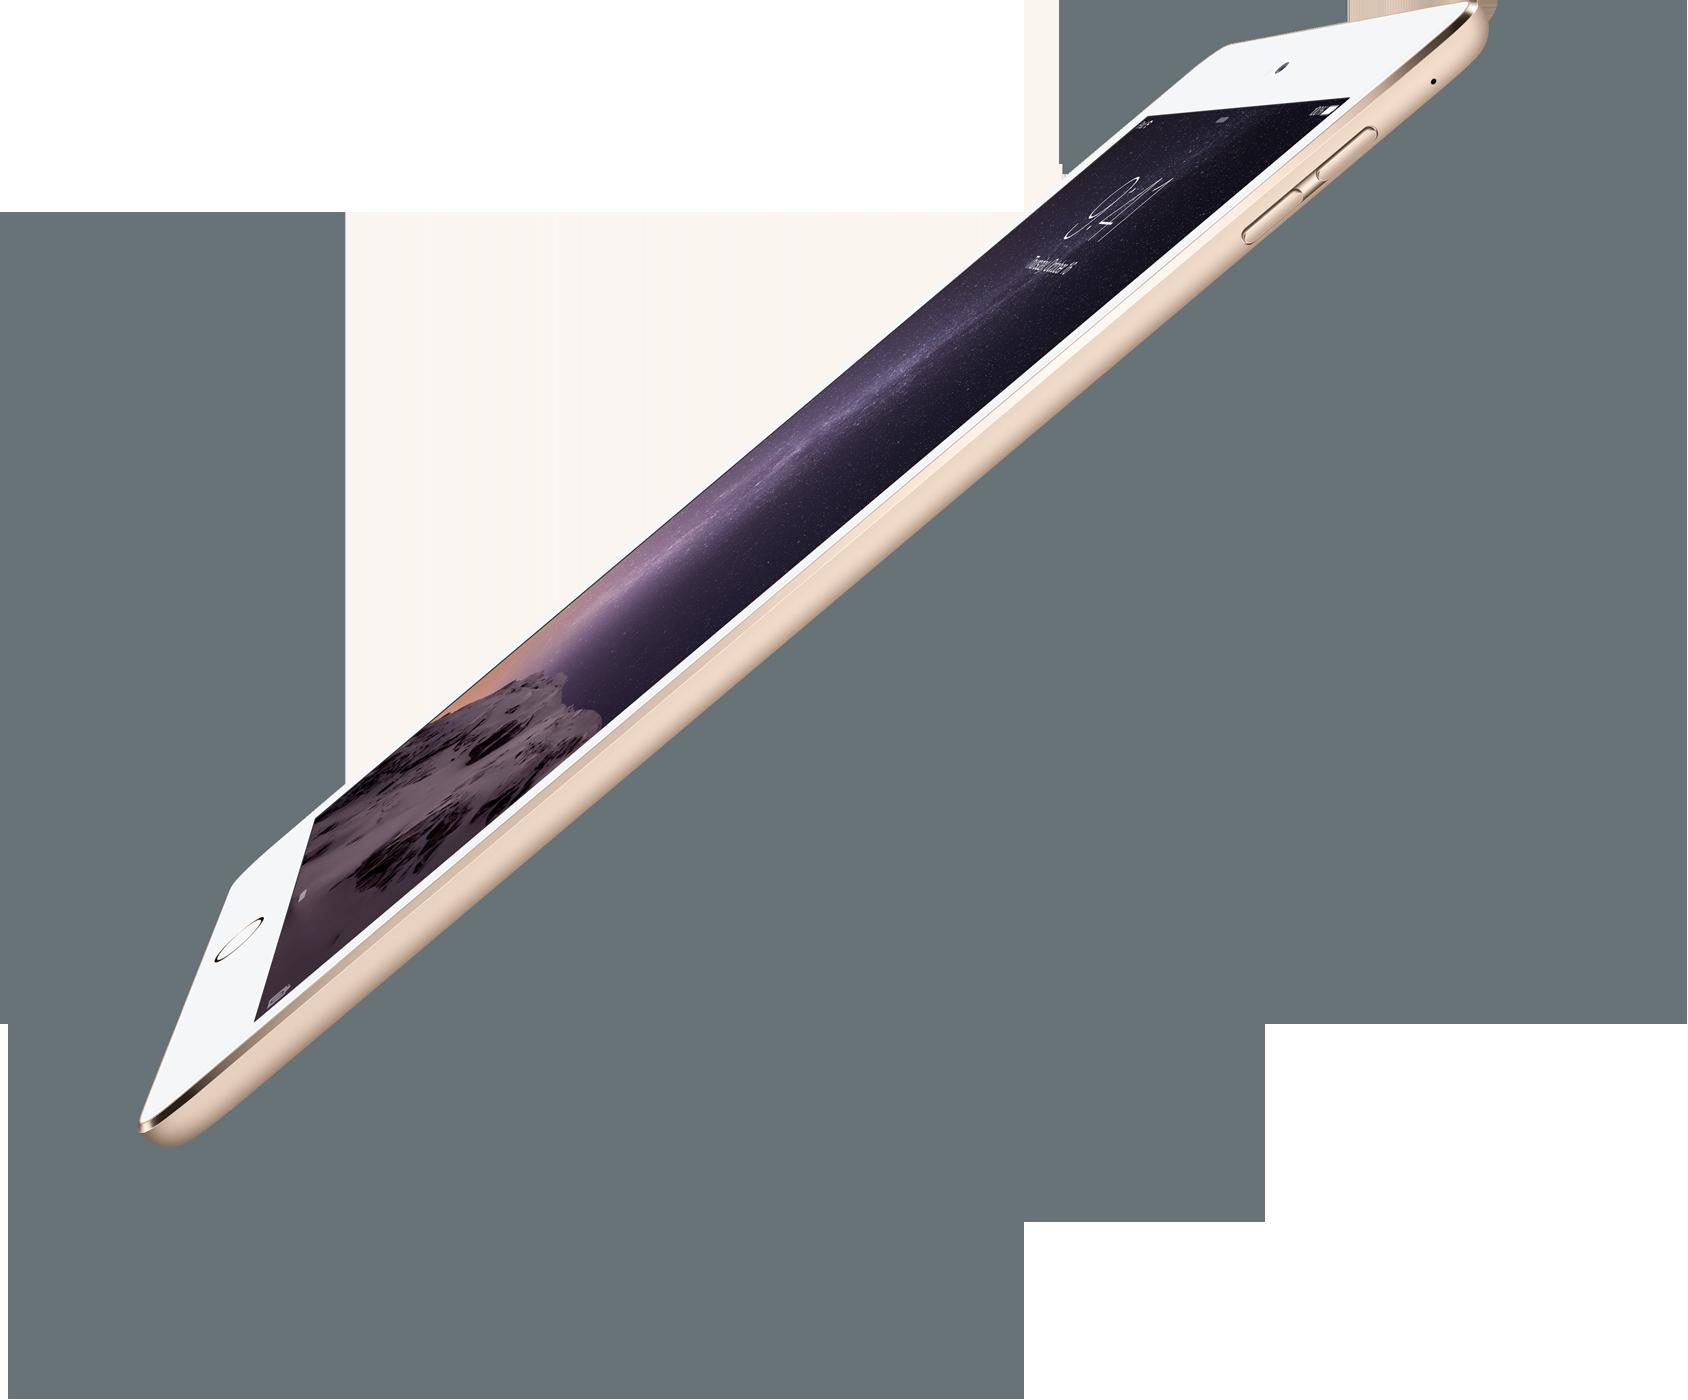 iPad Air 2 gold diagonal sideway